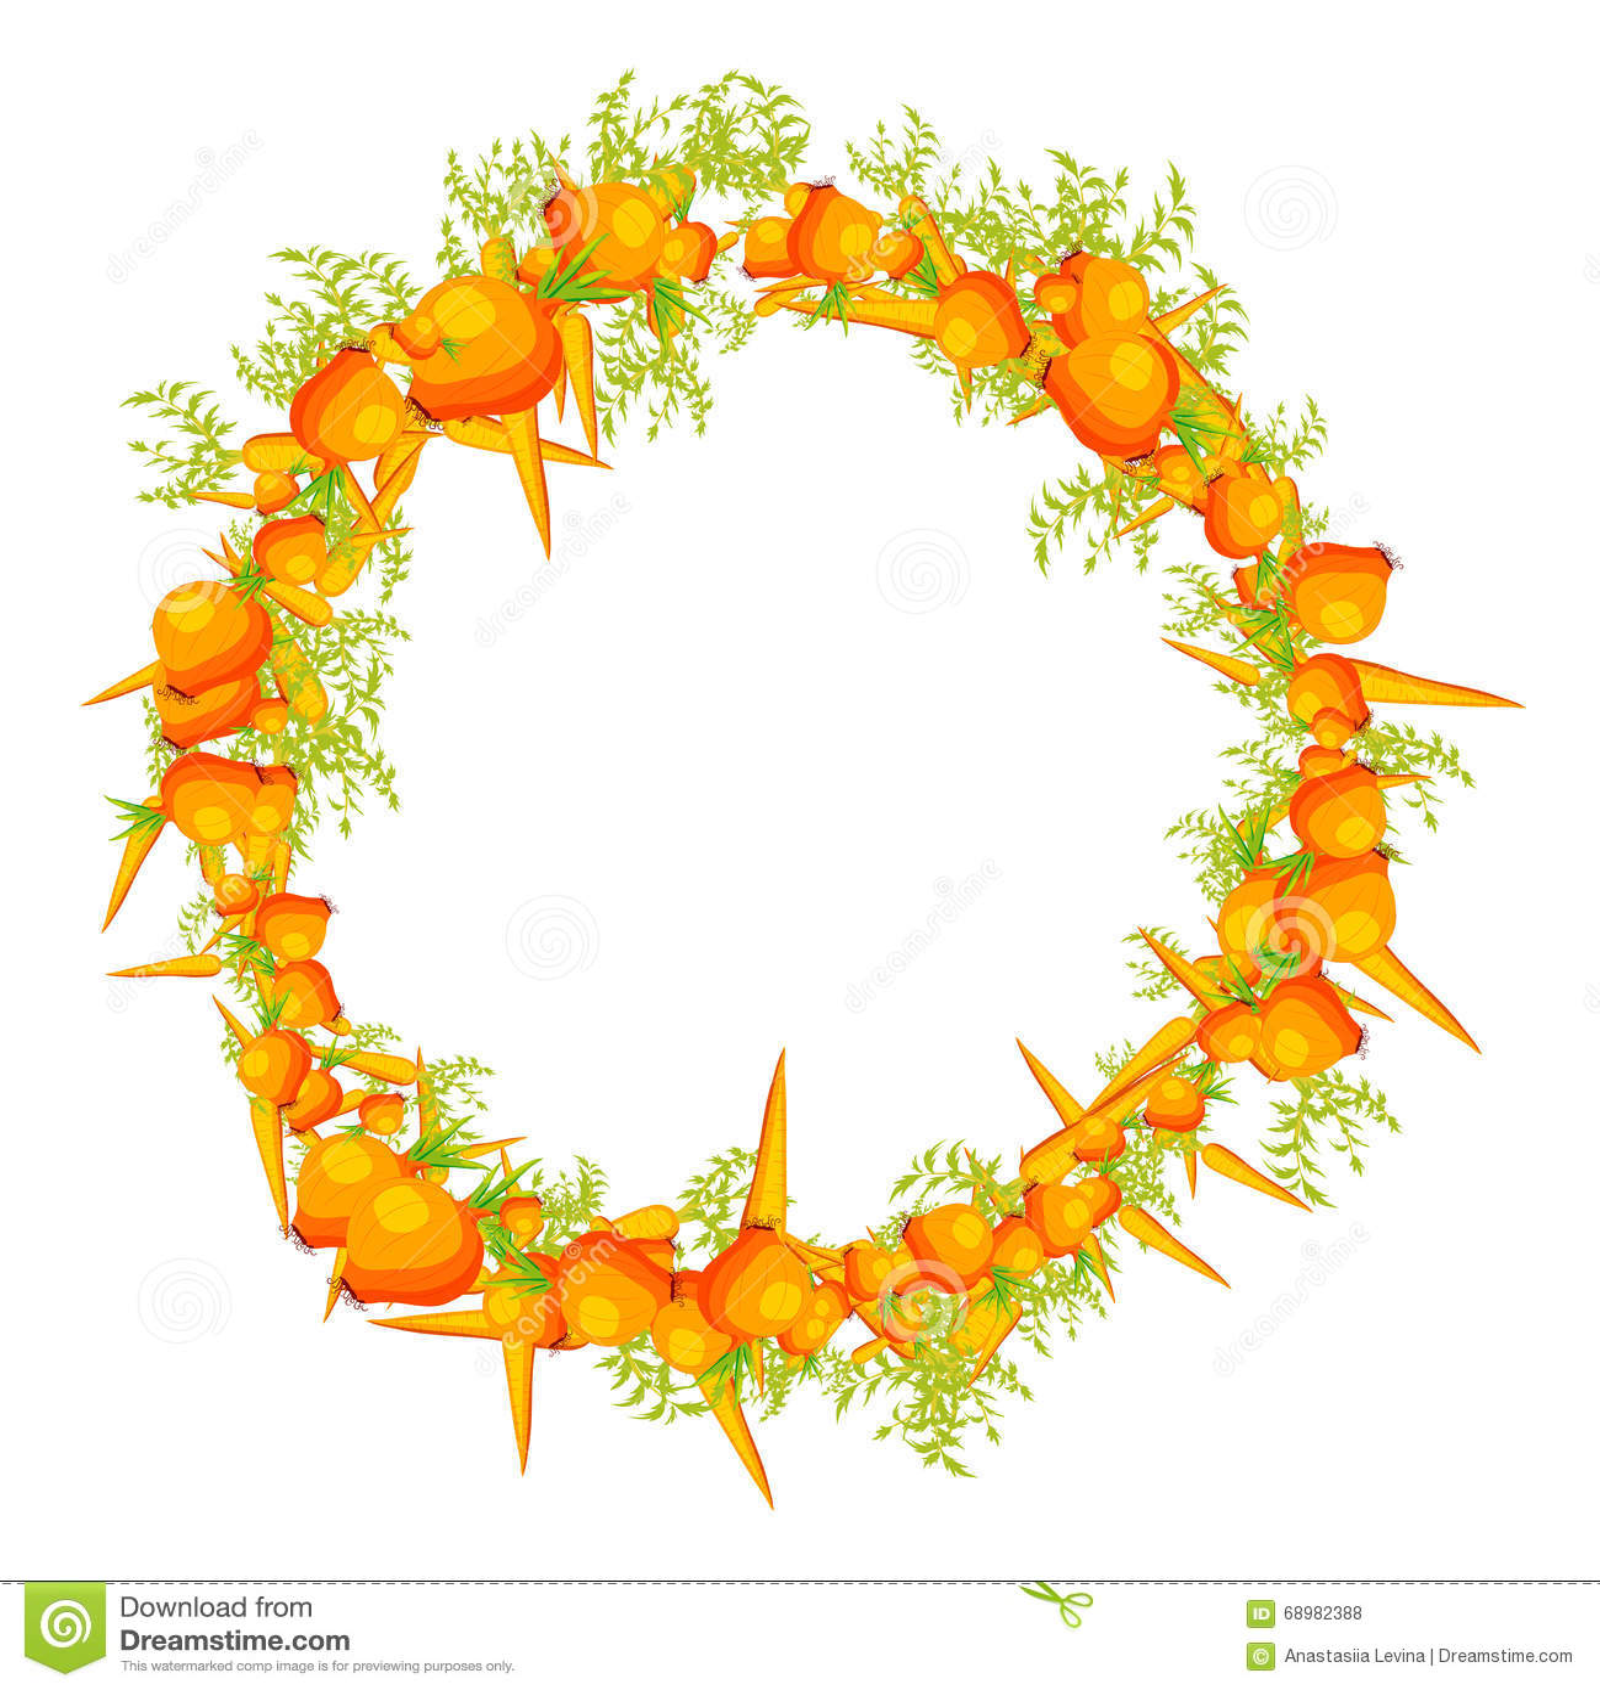 Guirnalda hecha de verduras